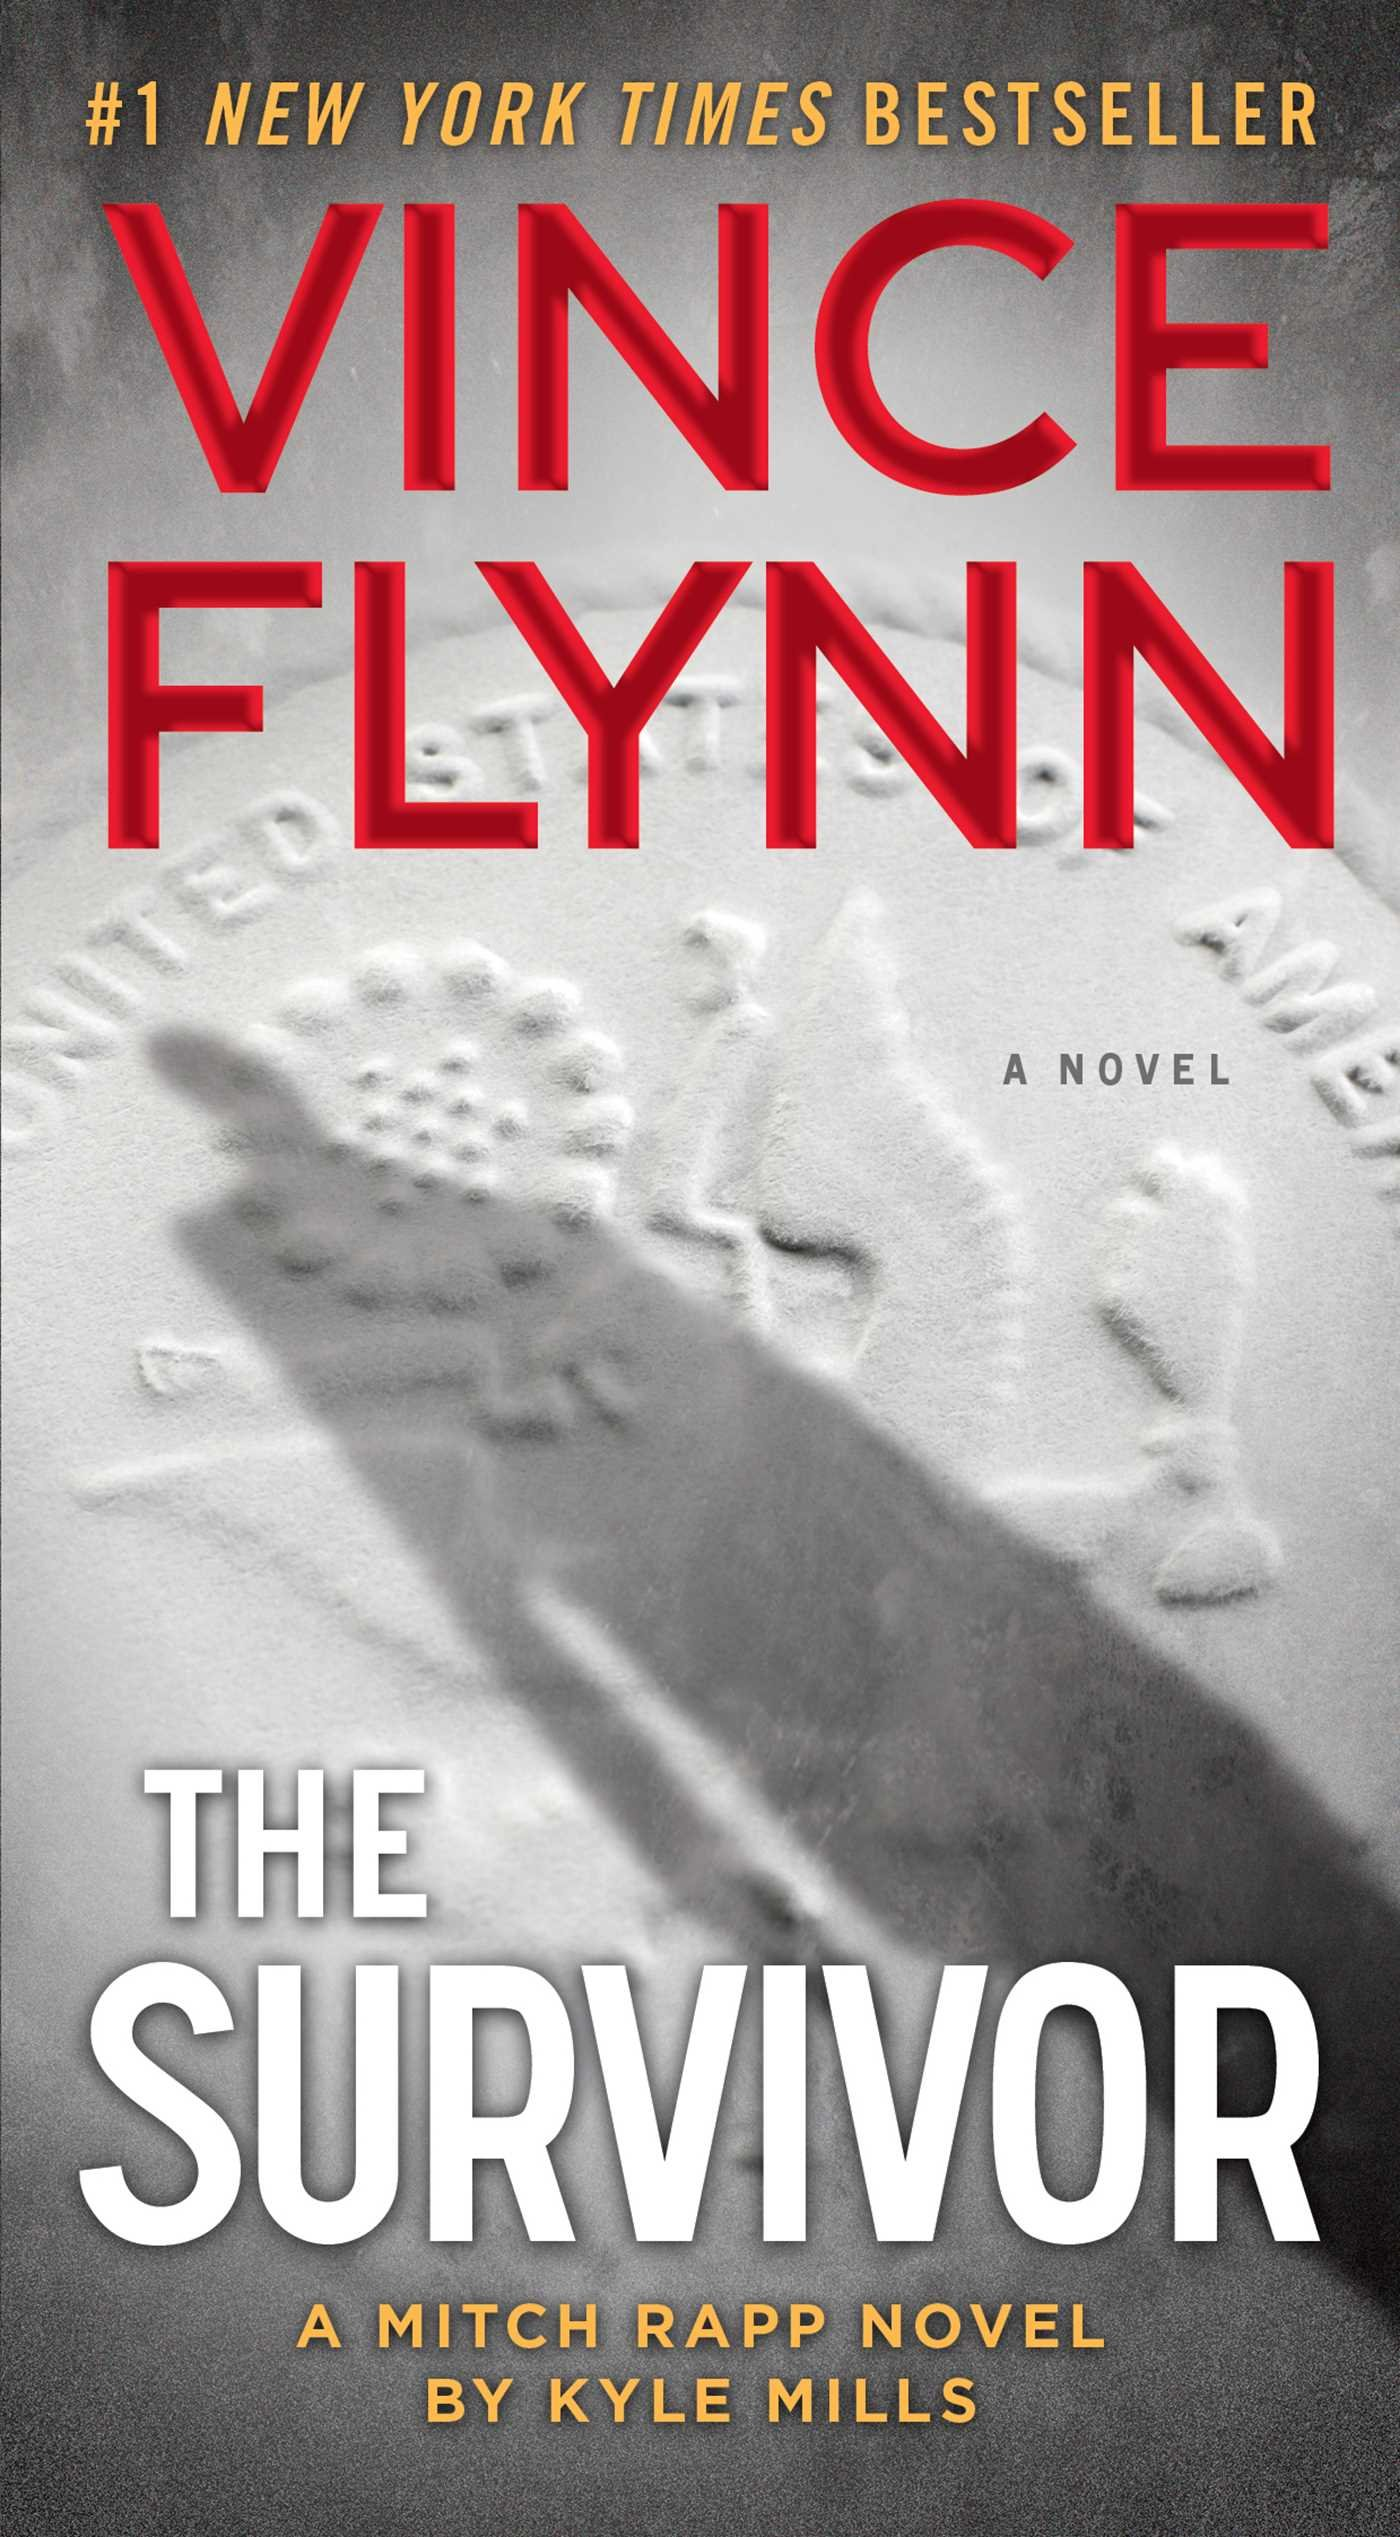 The Survivor (a Mitch Rapp Novel): Vince Flynn, Kyle Mills: 9781476783468:  Amazon: Books